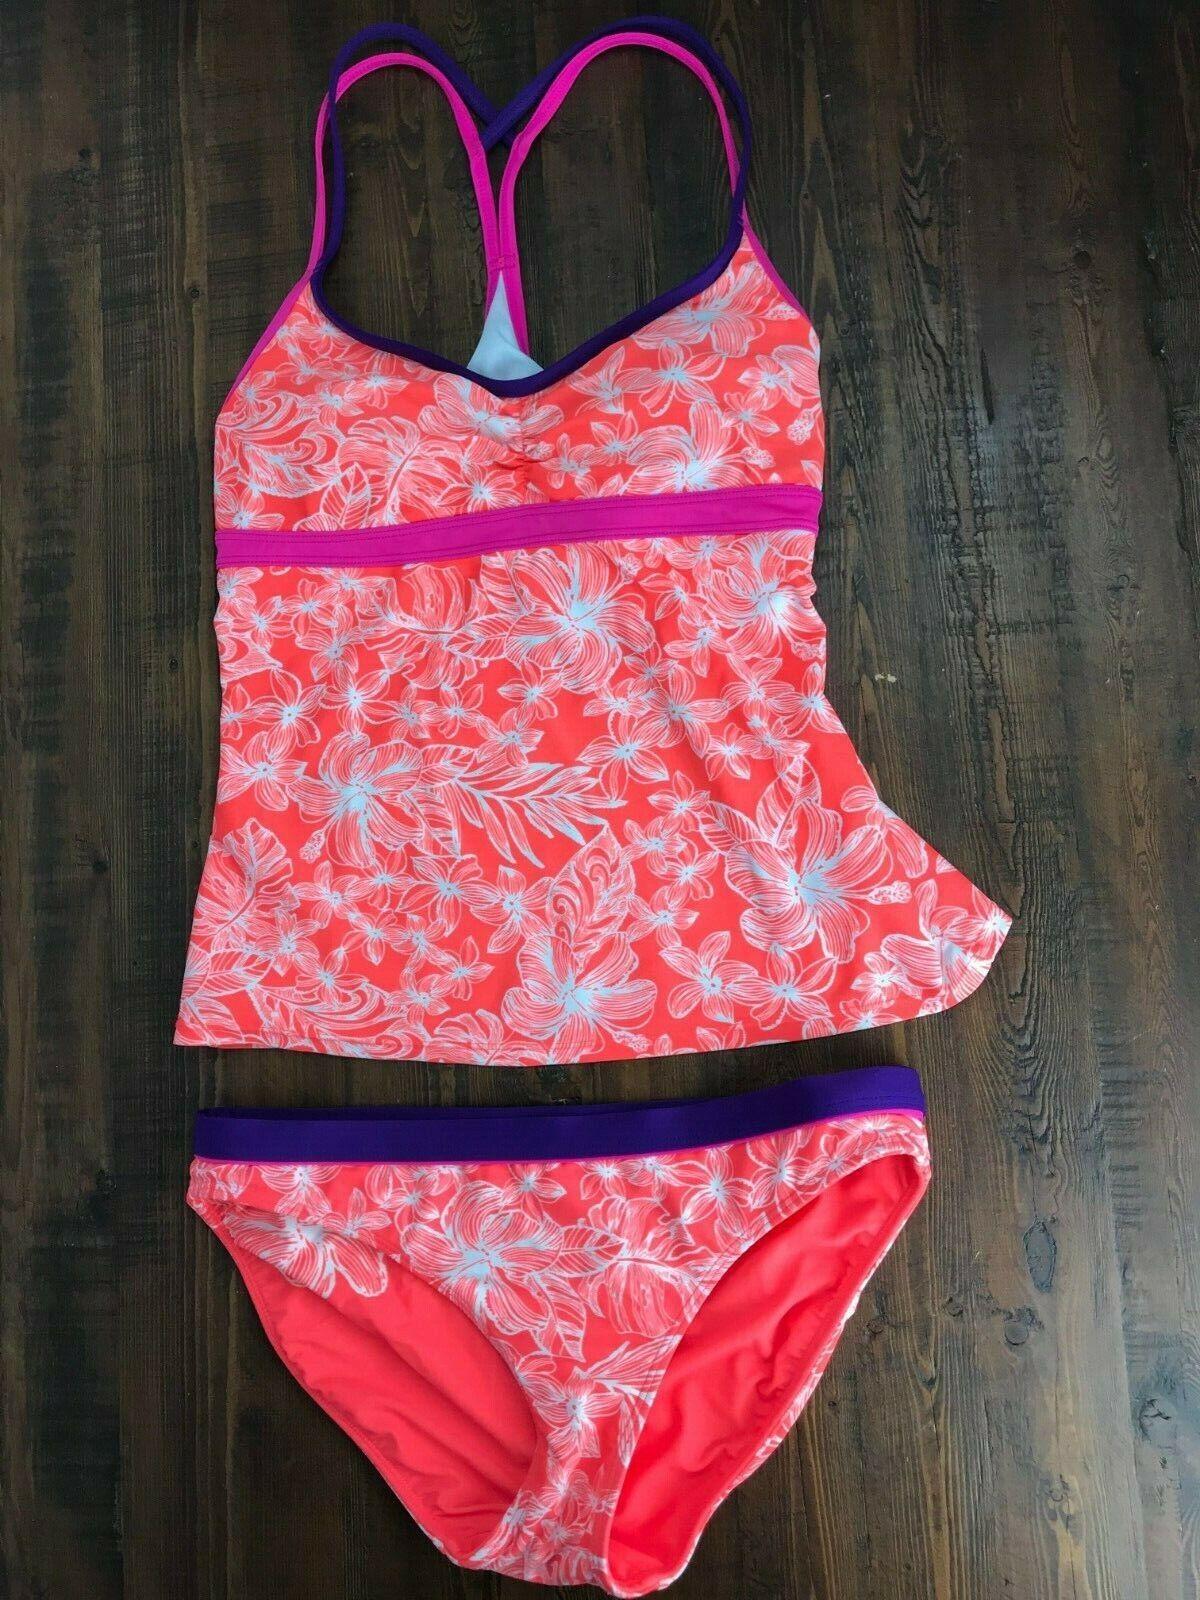 Athleta Tank Top and Swim Brief Two-Piece Swimsuit